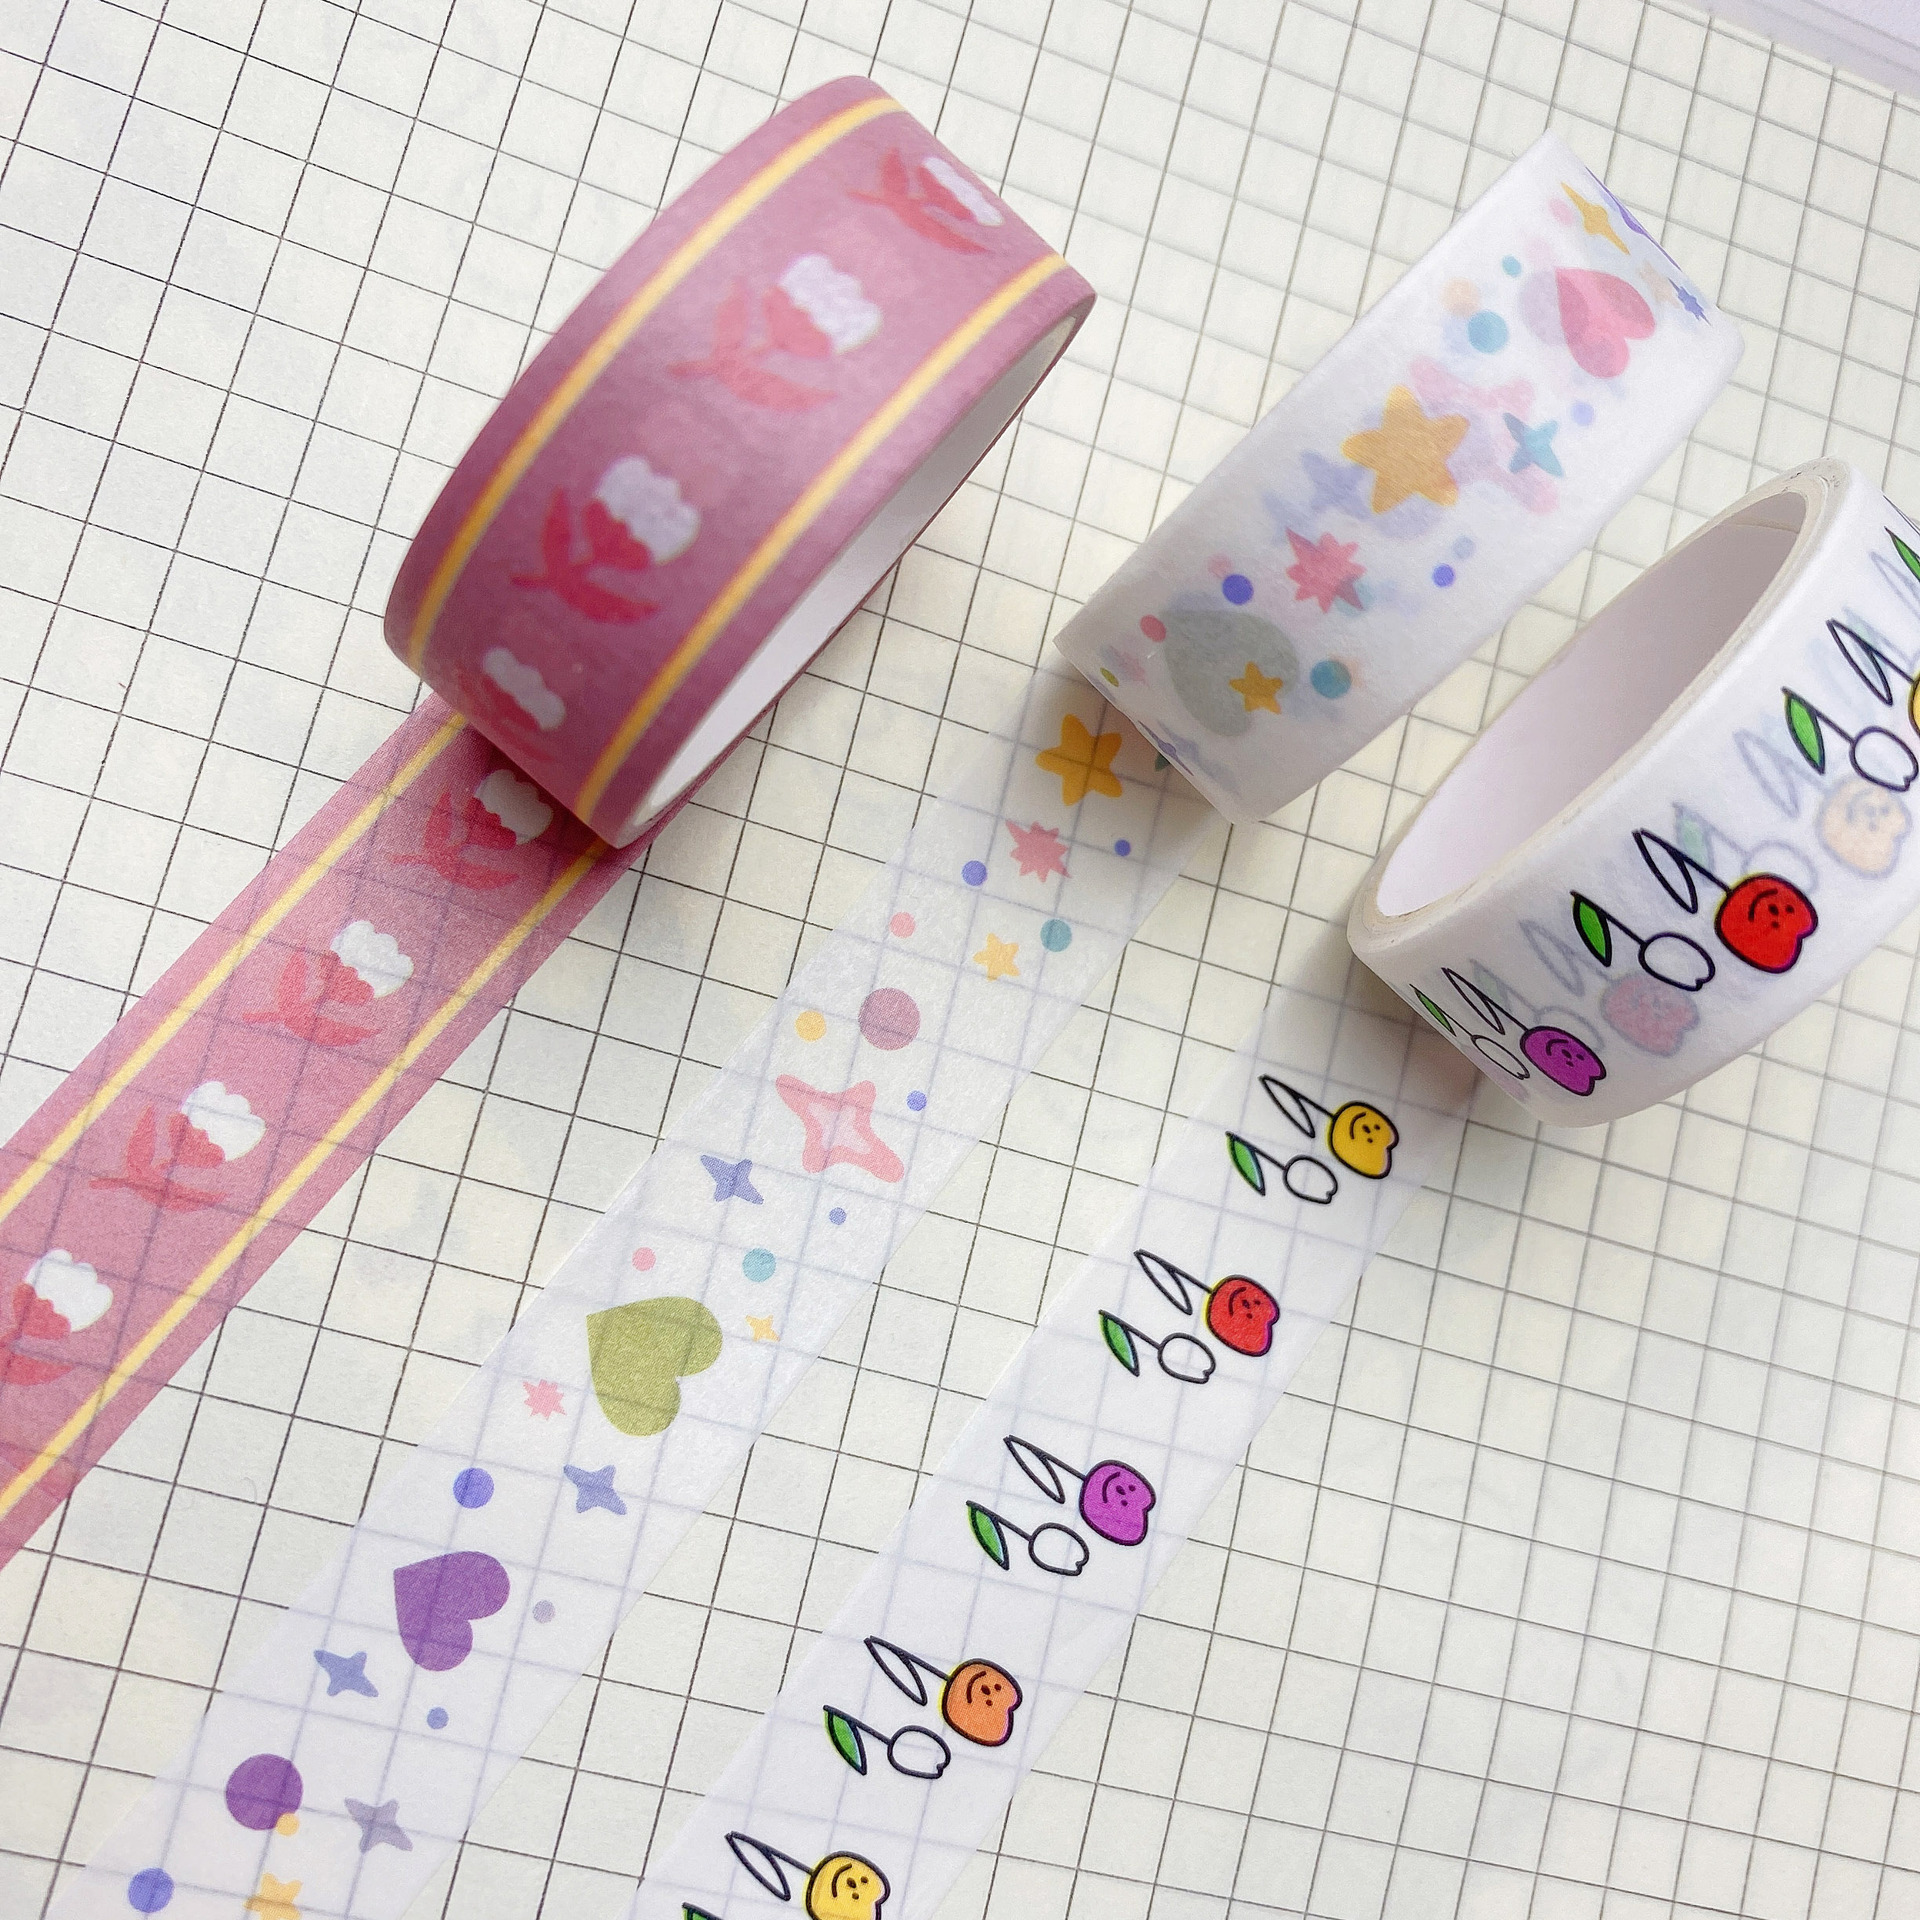 Steve 3m Korean Aesthetic Cute Bear Tulip Washi Tape Student Cartoon DIY Scrapbook Planner Bujo Decorative Materials Sticker